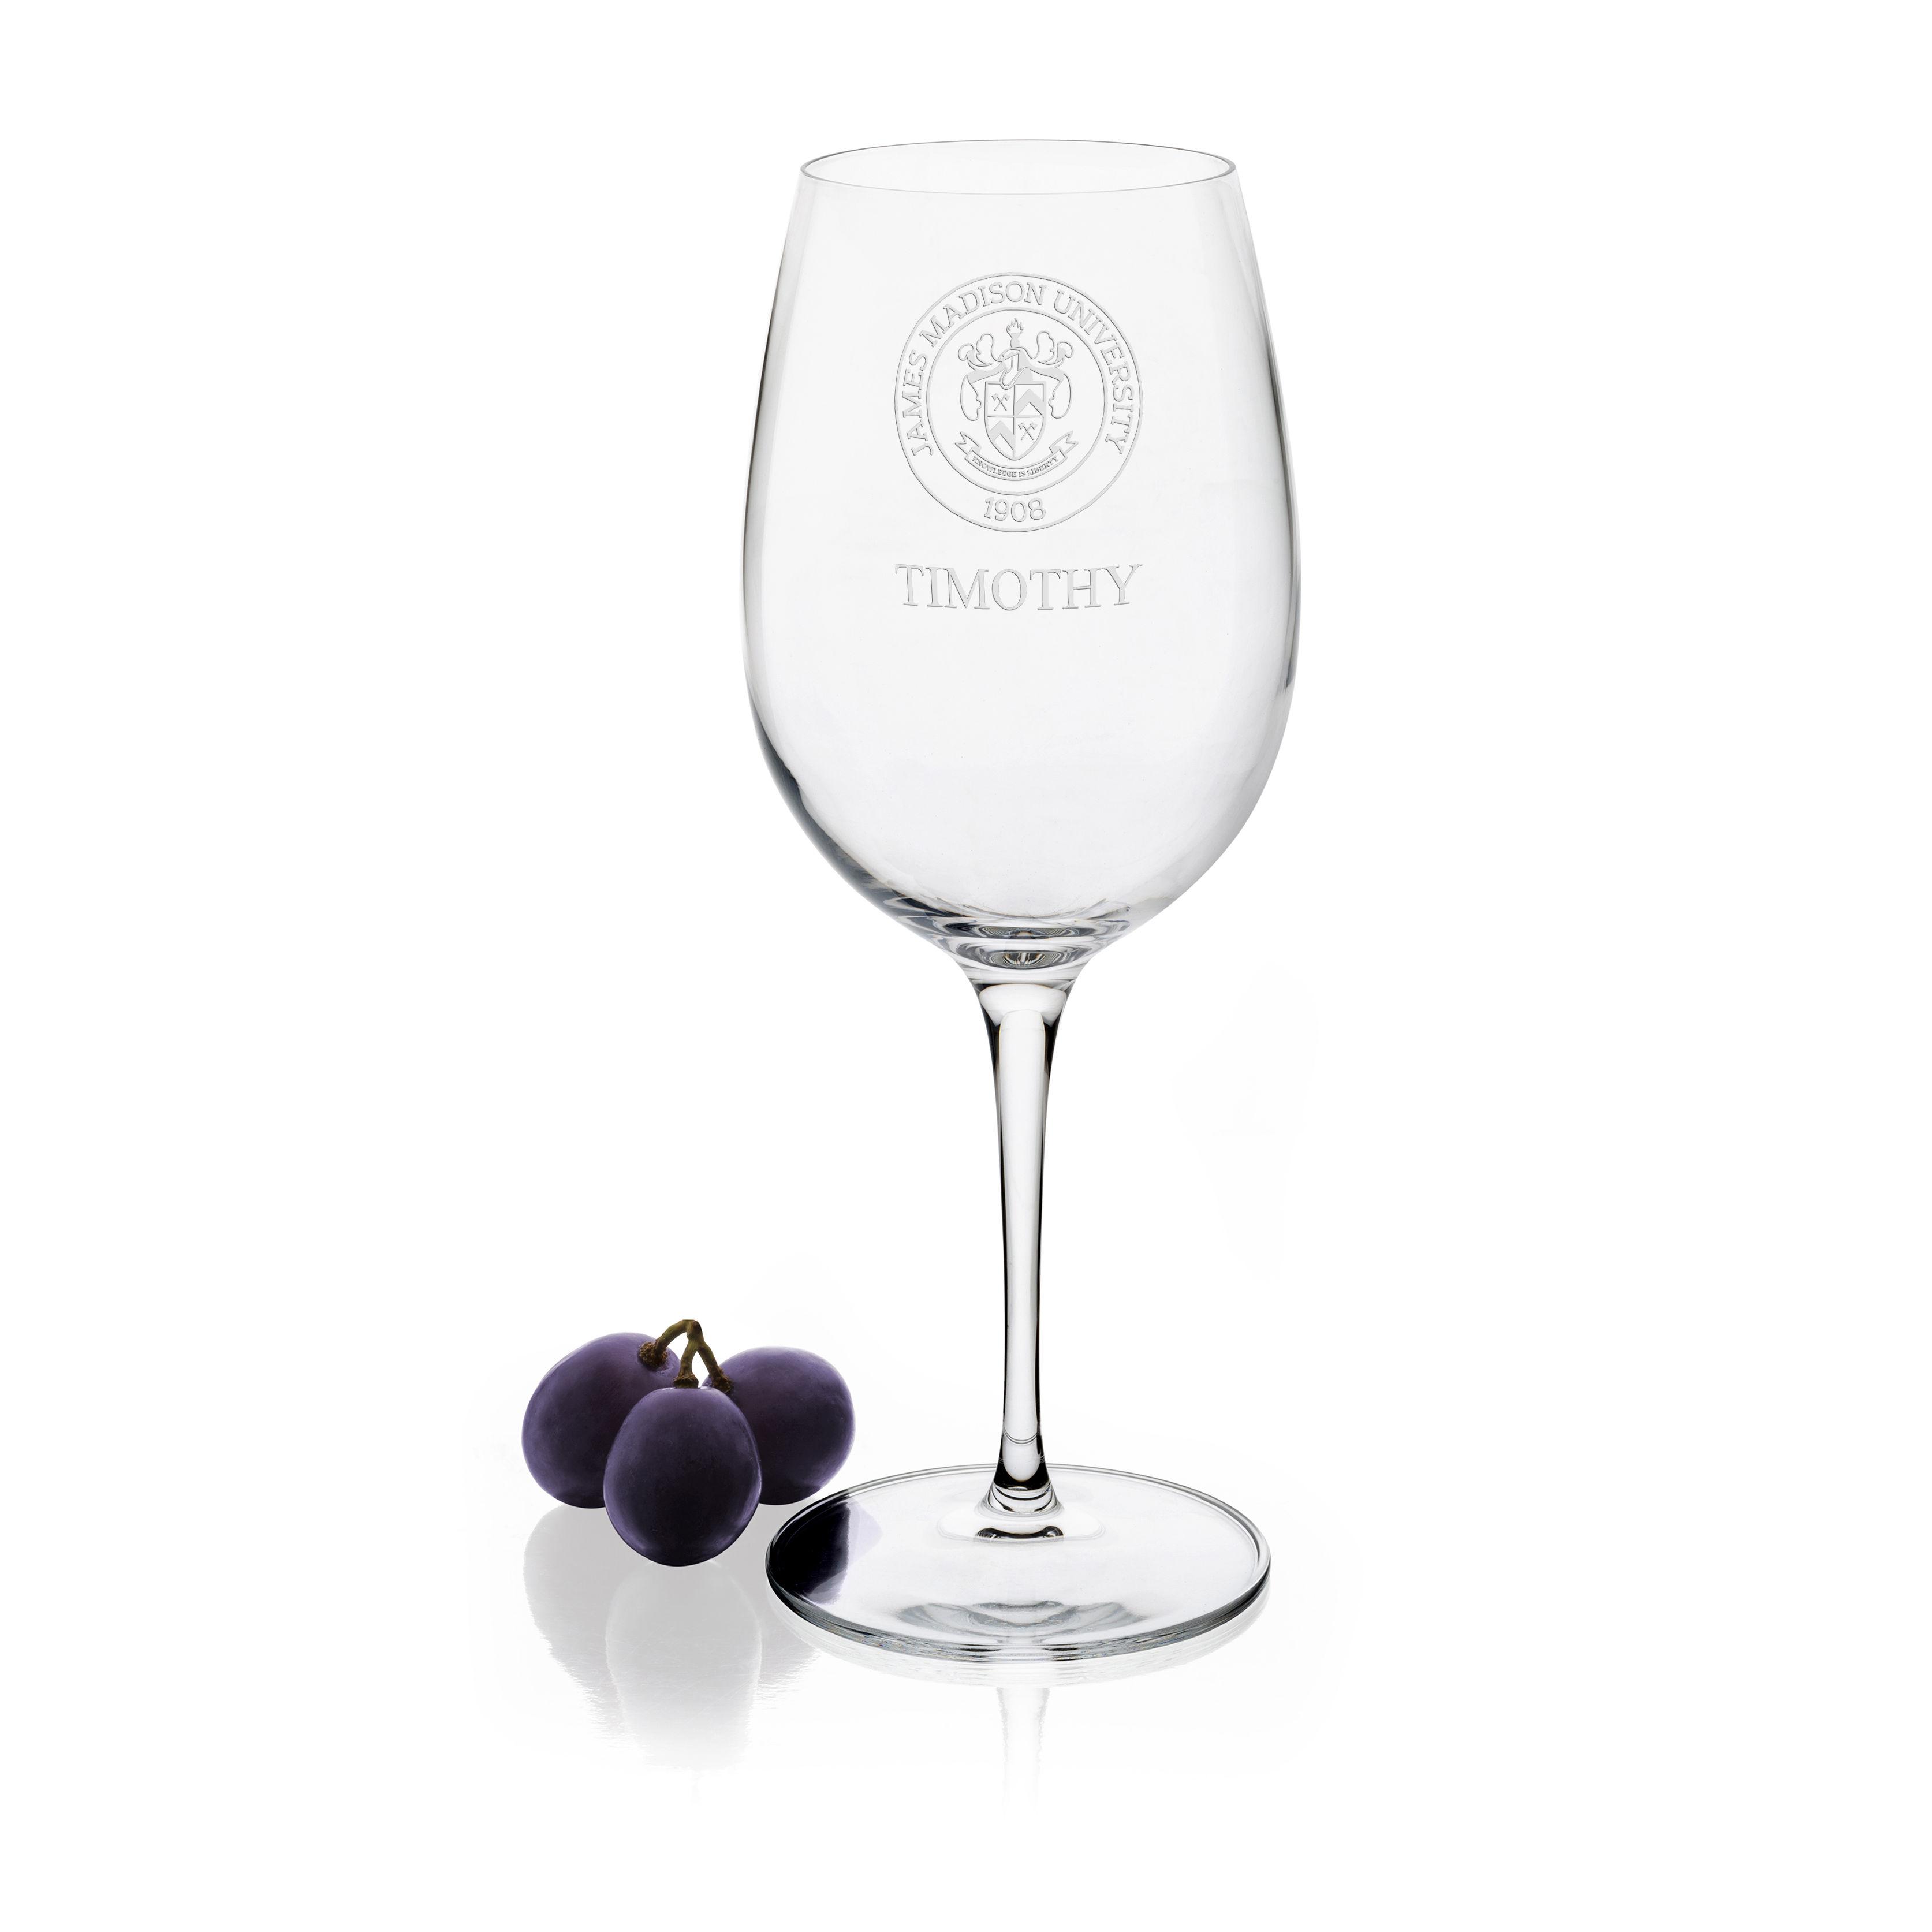 James Madison University Red Wine Glasses - Set of 2